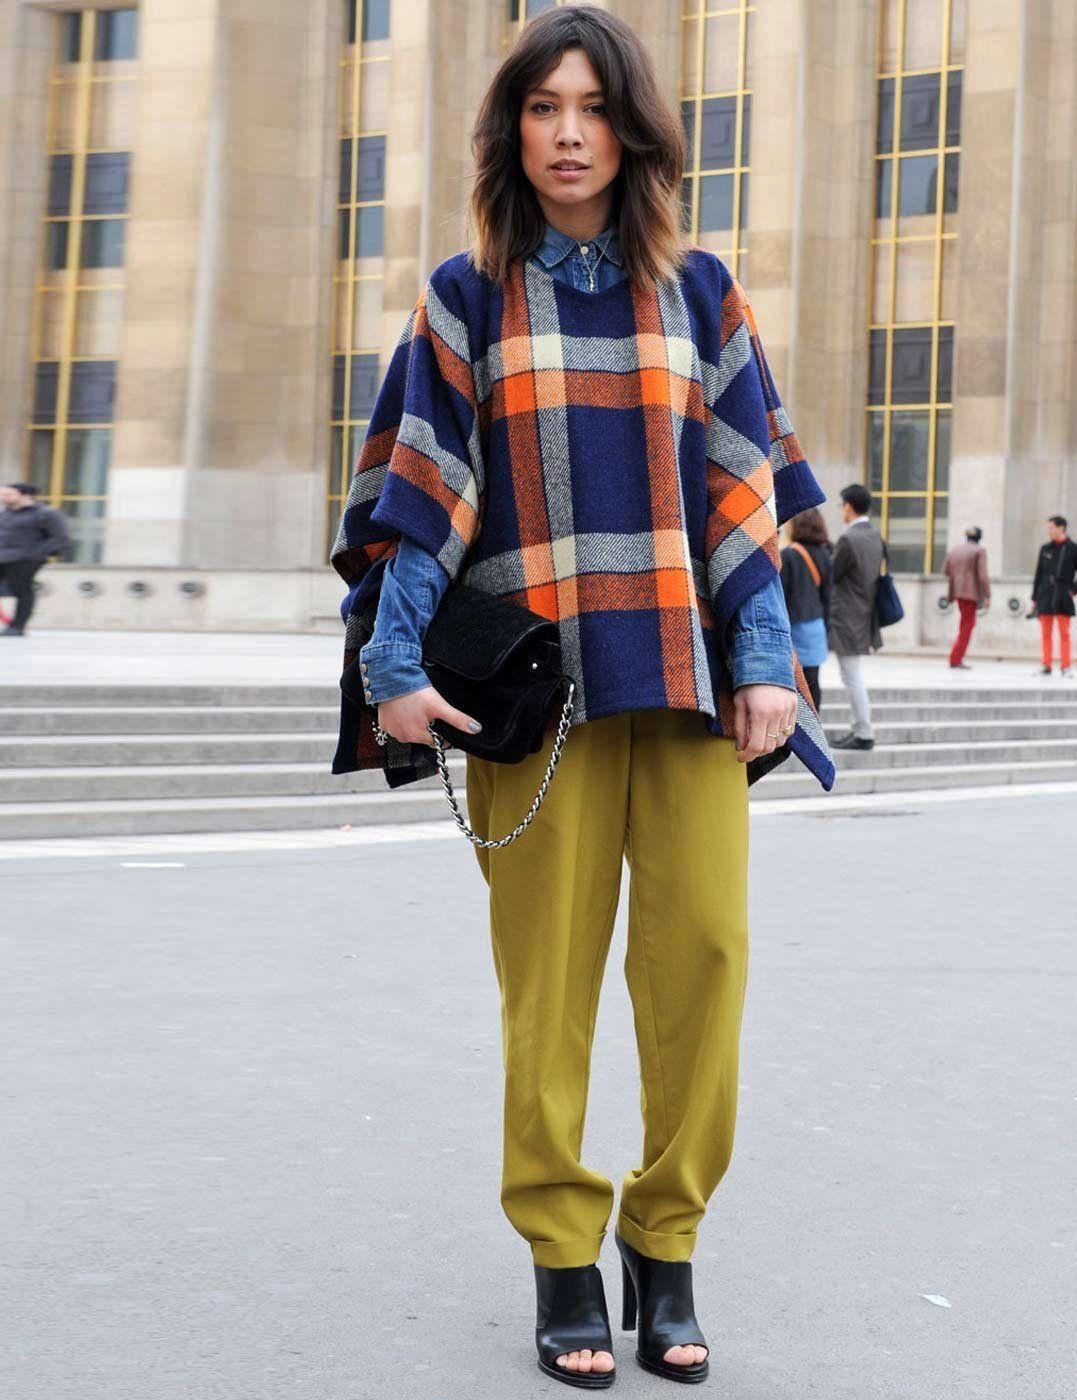 #streetstyle #style #streetfashion #fashion #poncho #cape